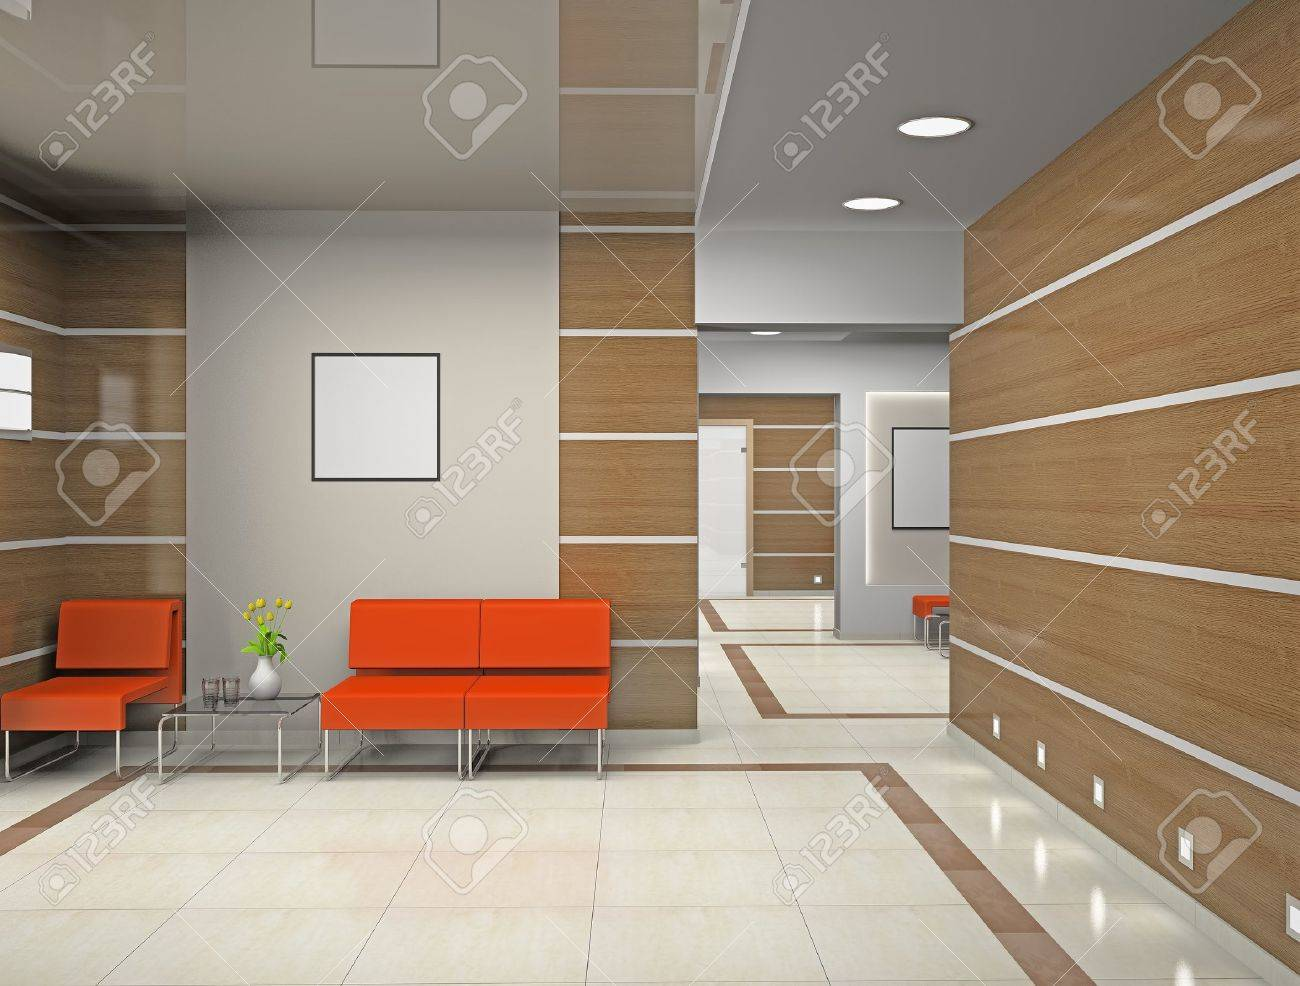 Hall a modern office (3D) Stock Photo - 10544984